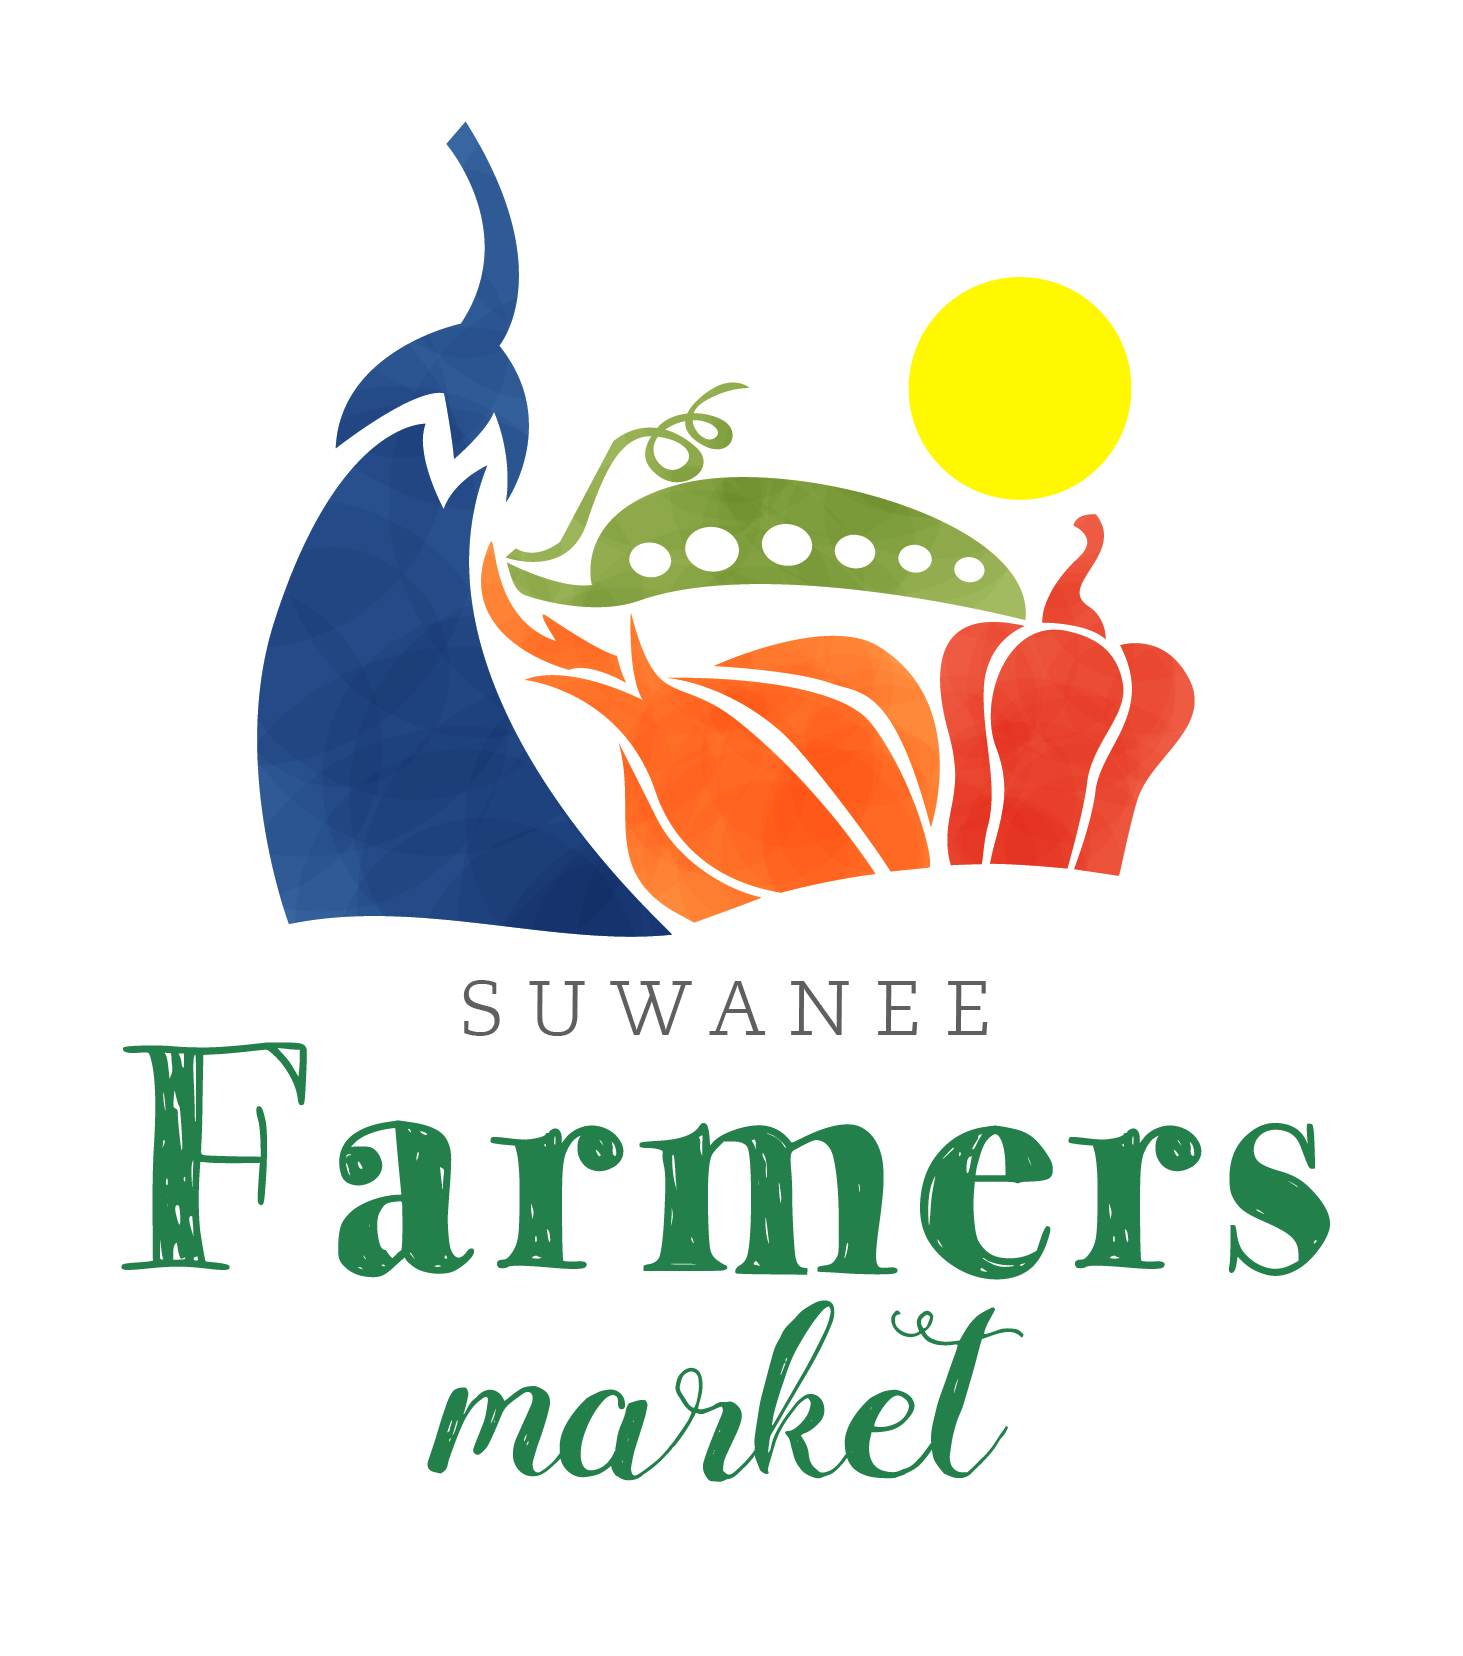 2021 Suwanee Fourth Saturday Farmers Market